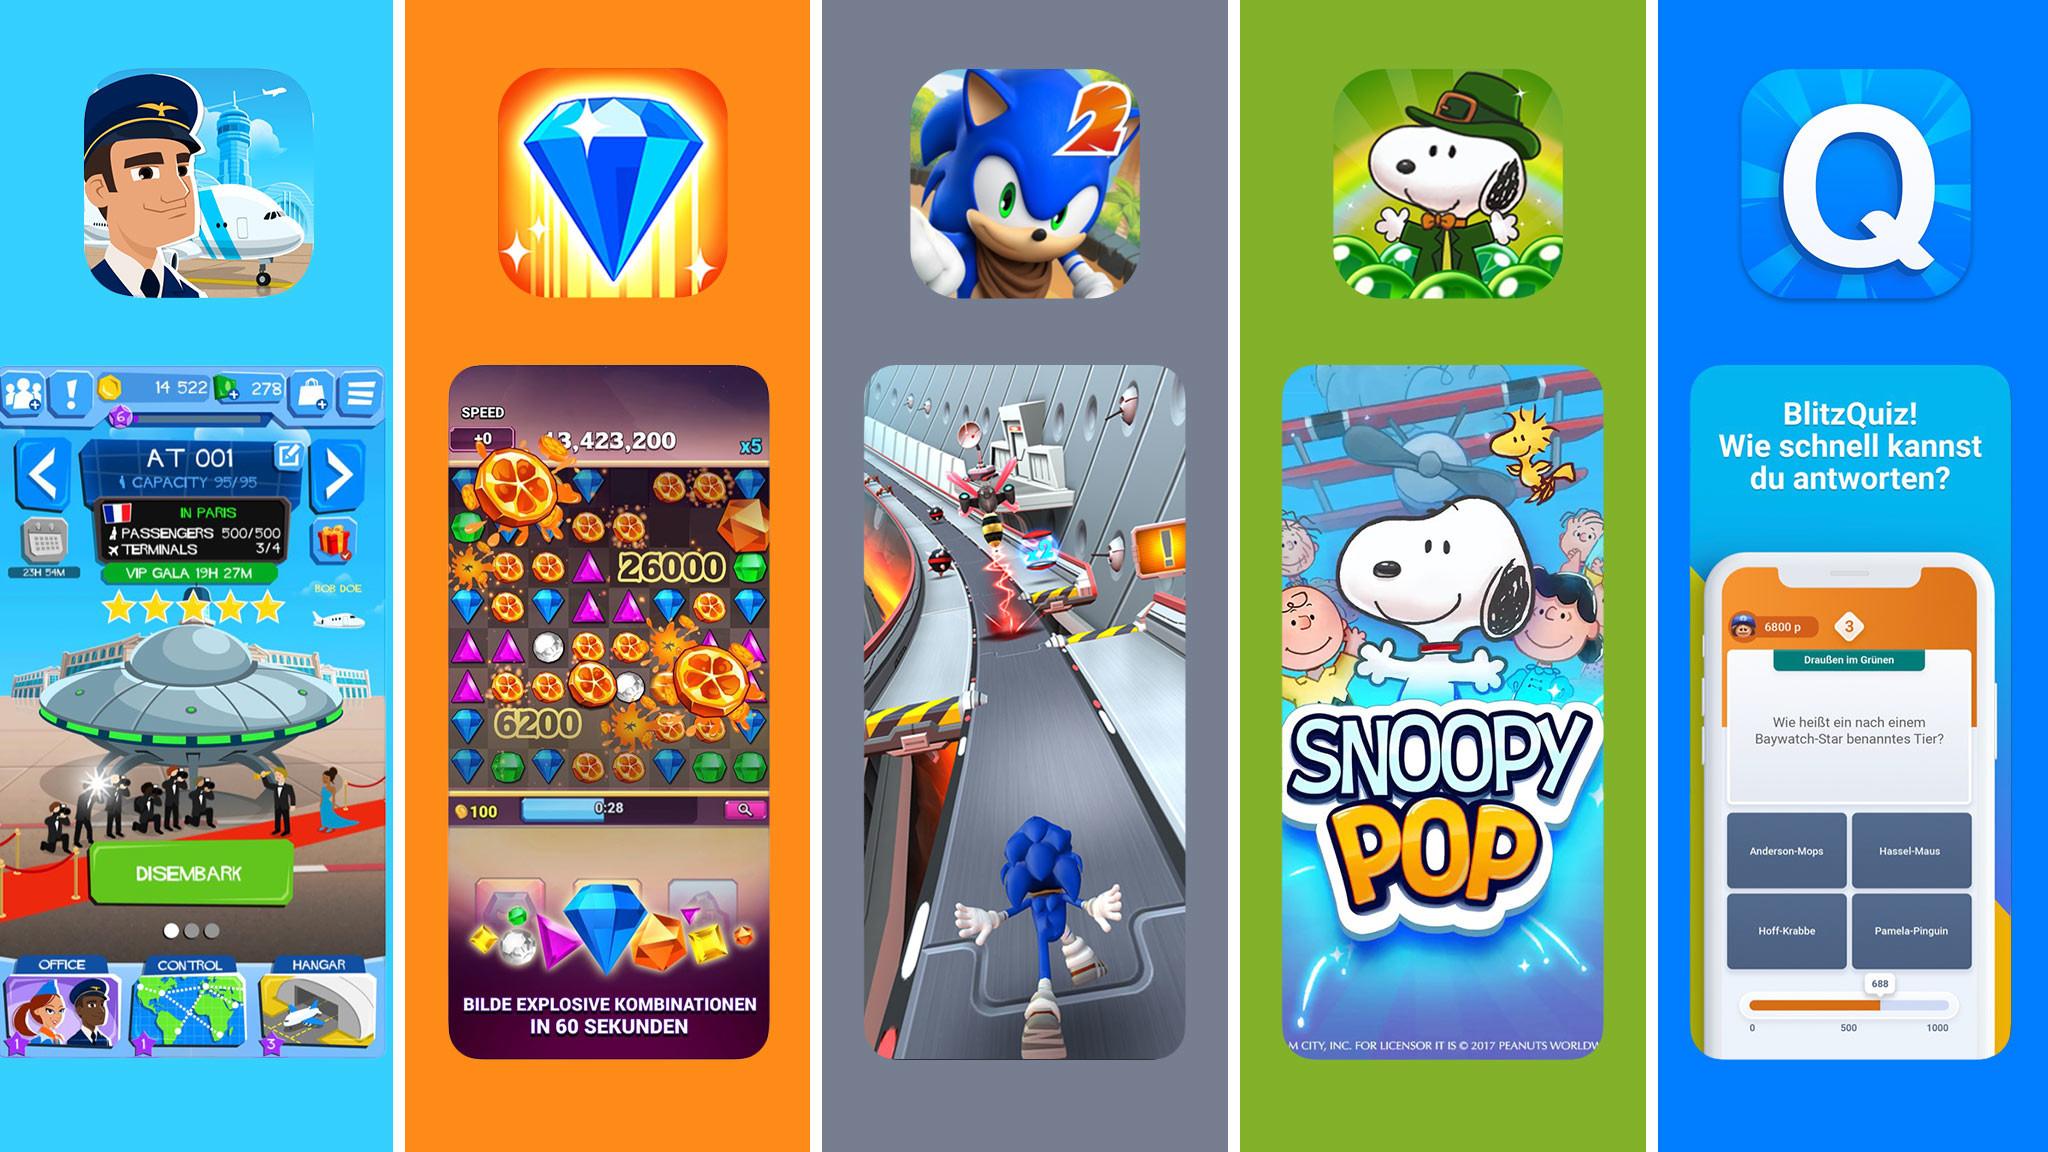 App Spiele Gegen Freunde